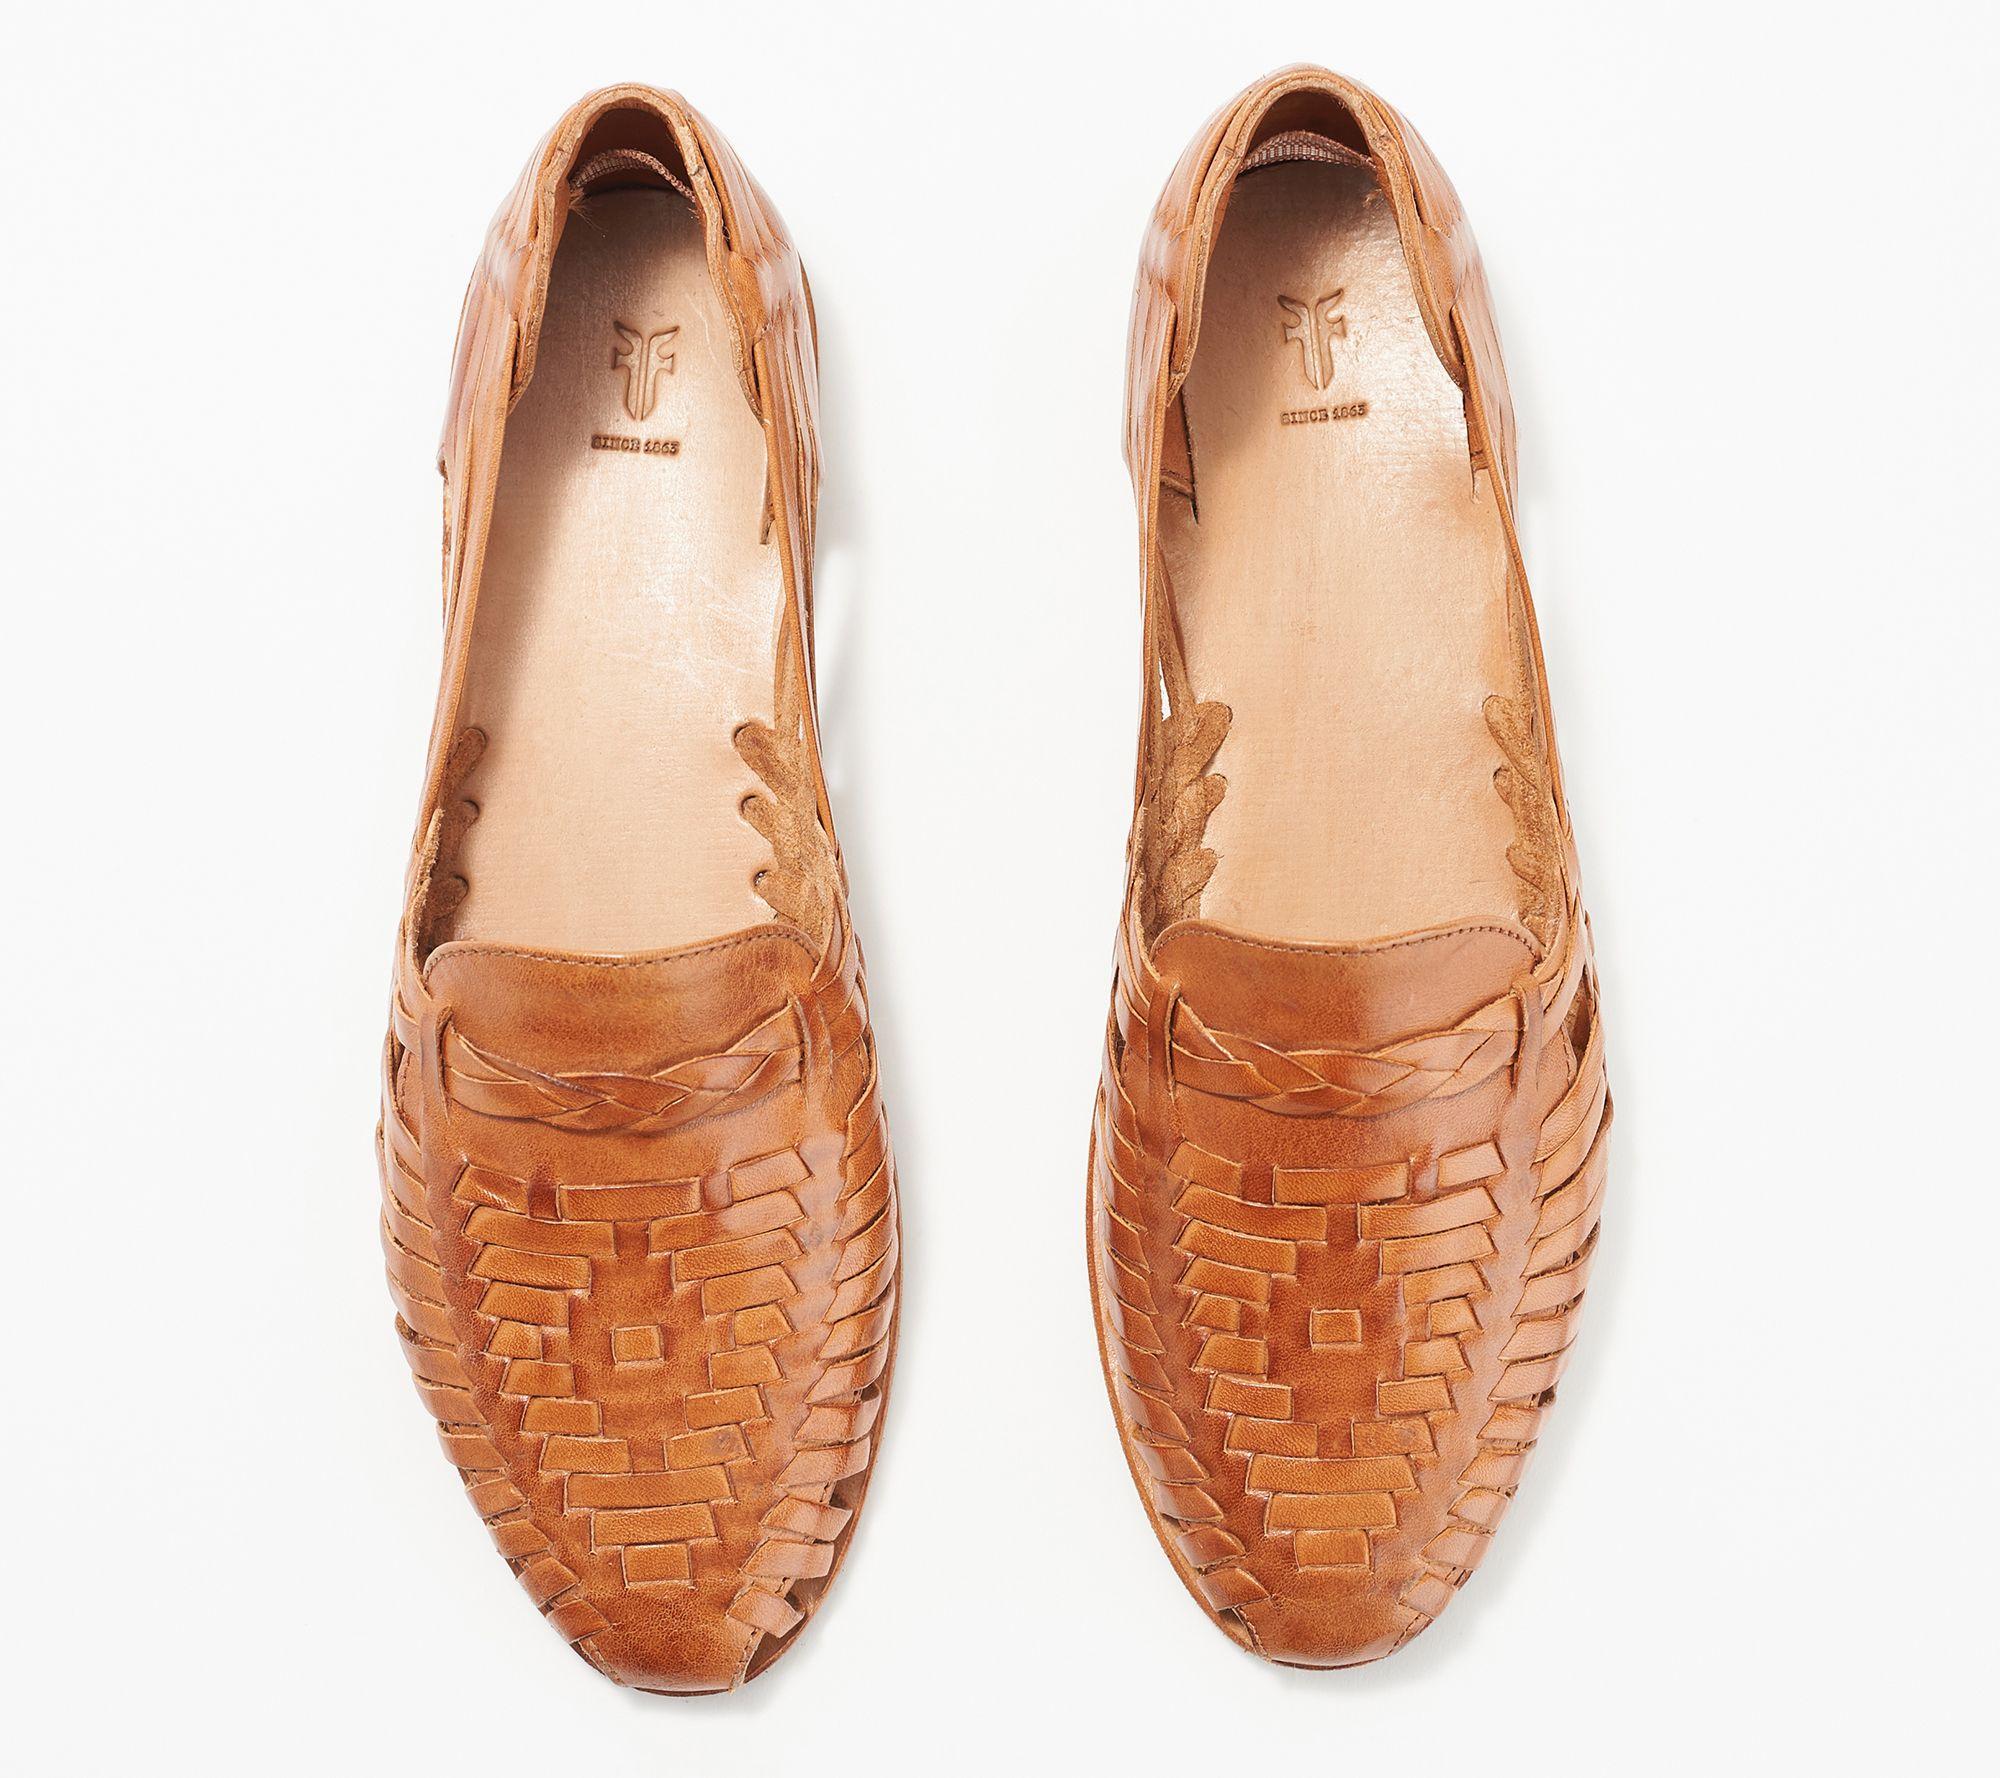 0be160f017d Frye Leather Slip-On Sandals - Heather Huarache — QVC.com